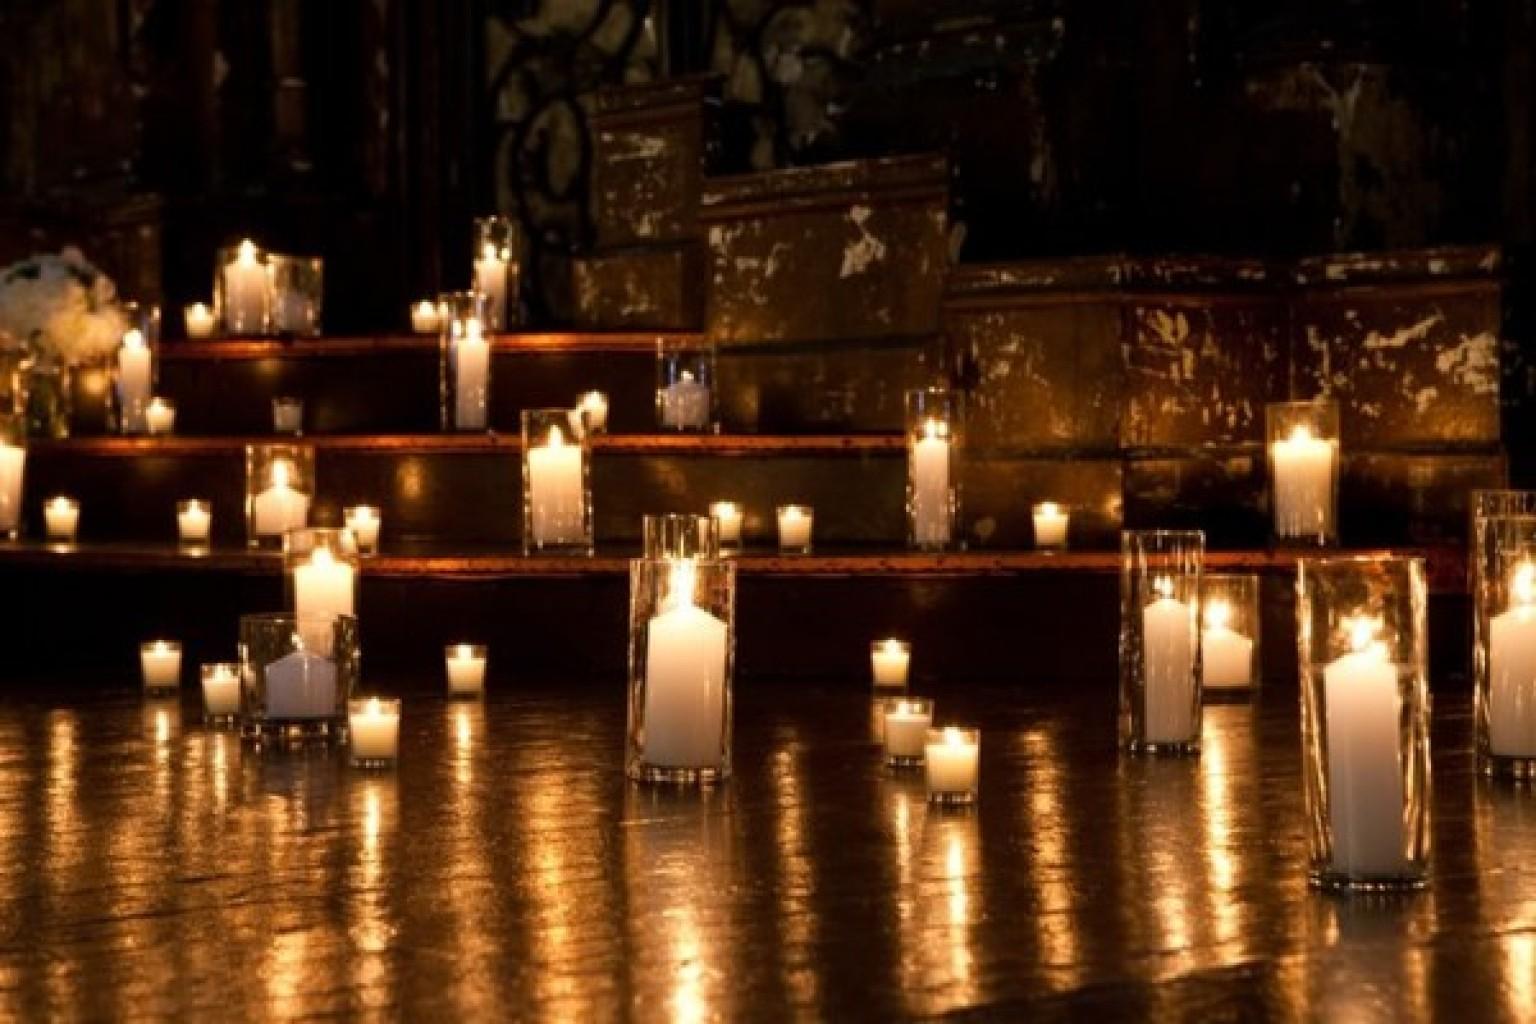 Candlelight Wedding Ideas For Romantic Ceremonies PHOTOS HuffPost